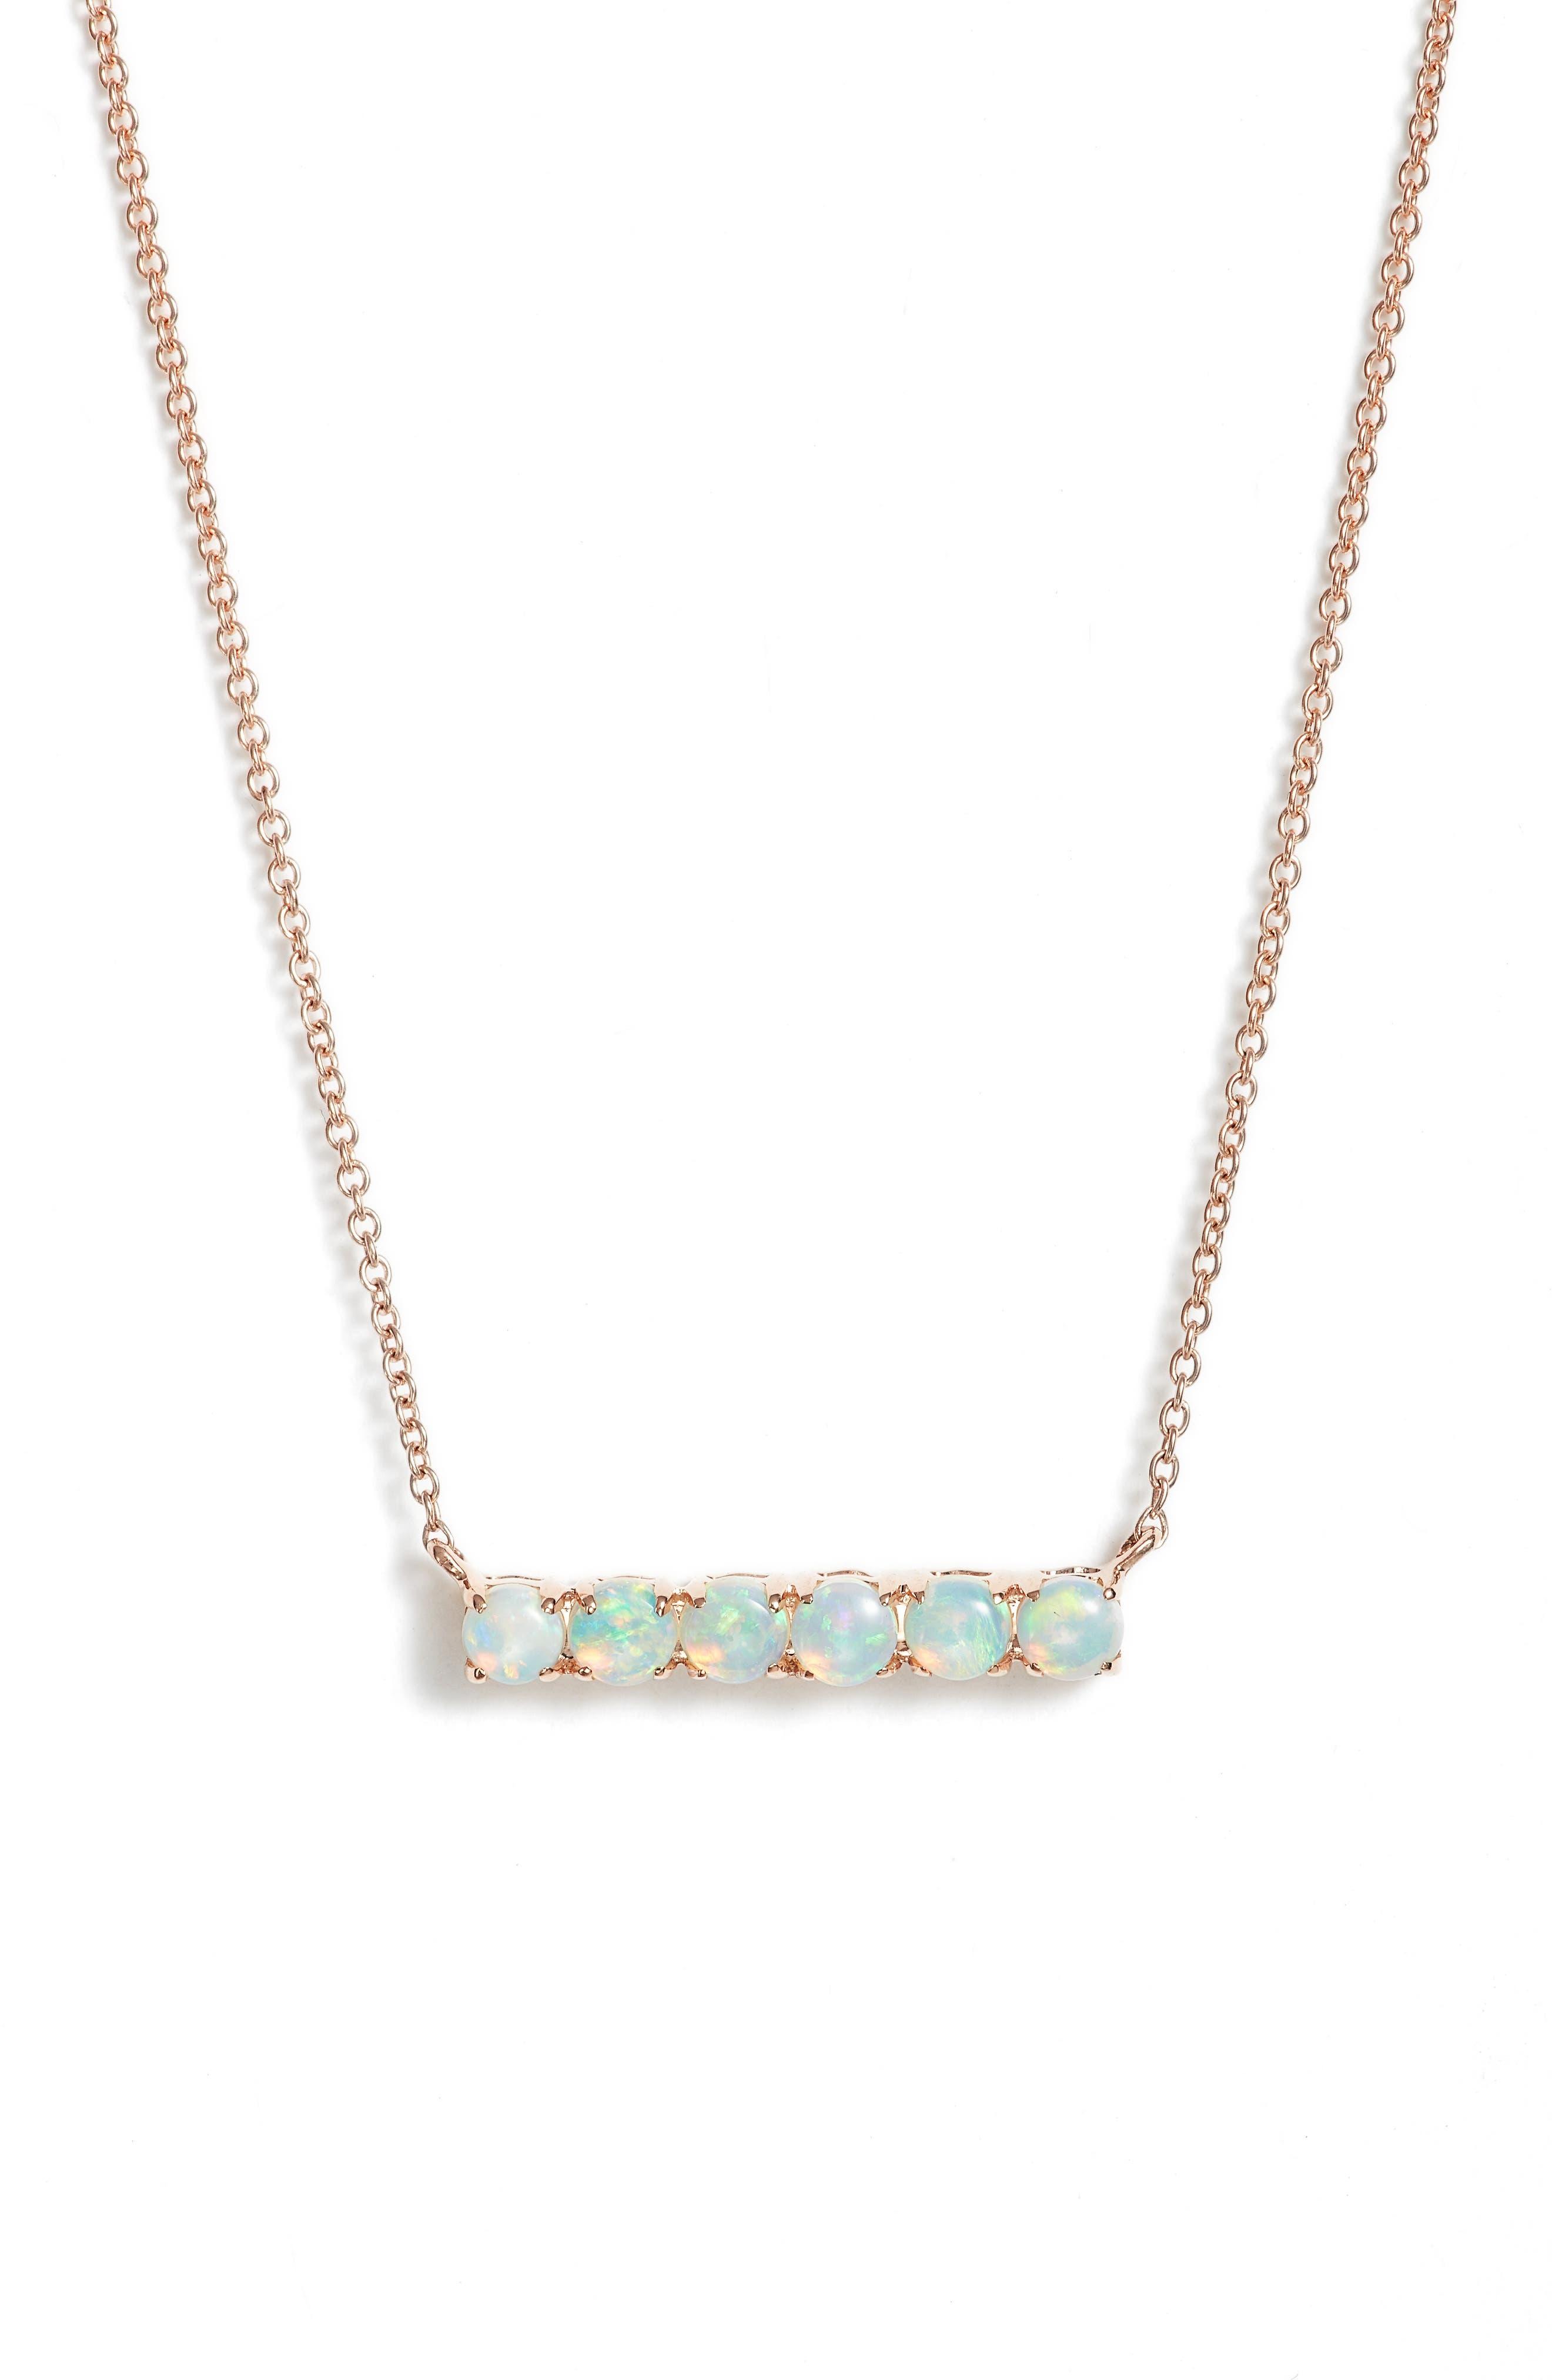 Alternate Image 1 Selected - Dana Rebecca Designs Bar Pendant Necklace